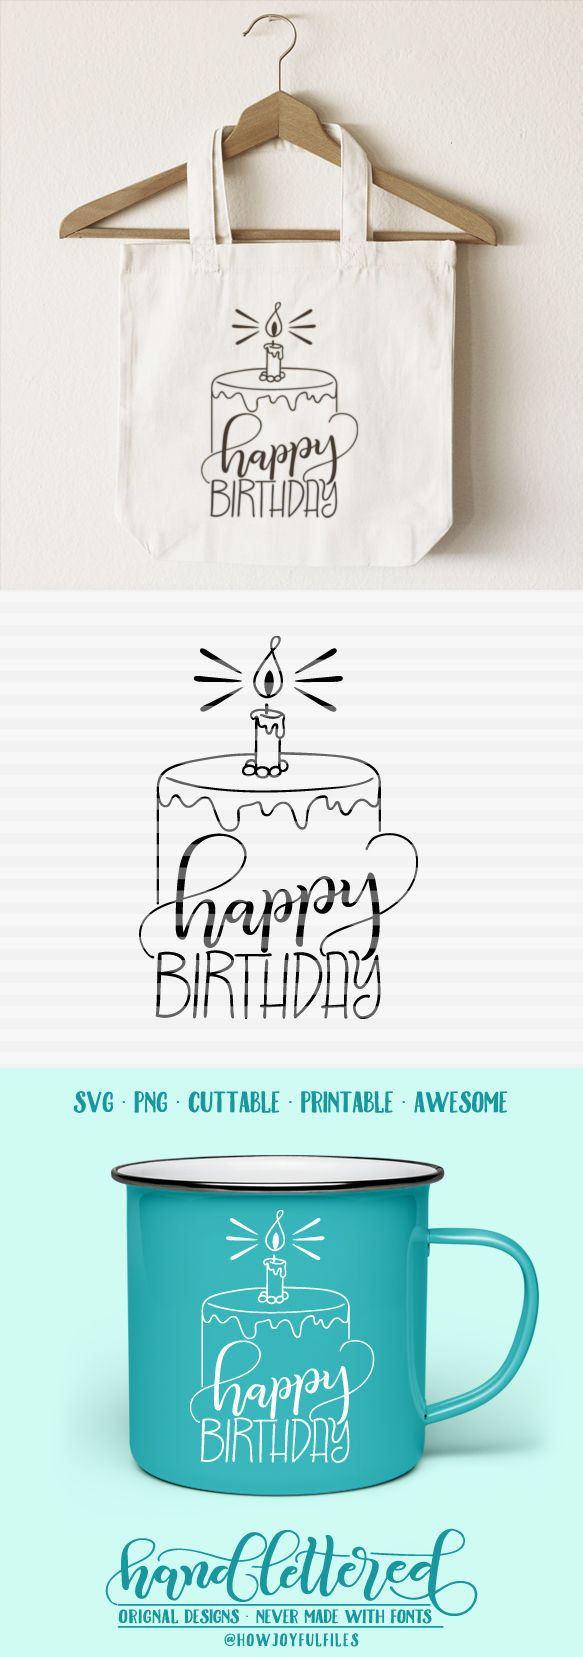 Happy Birthday Svg Pdf Dxf Hand Drawn Lettered Cut File